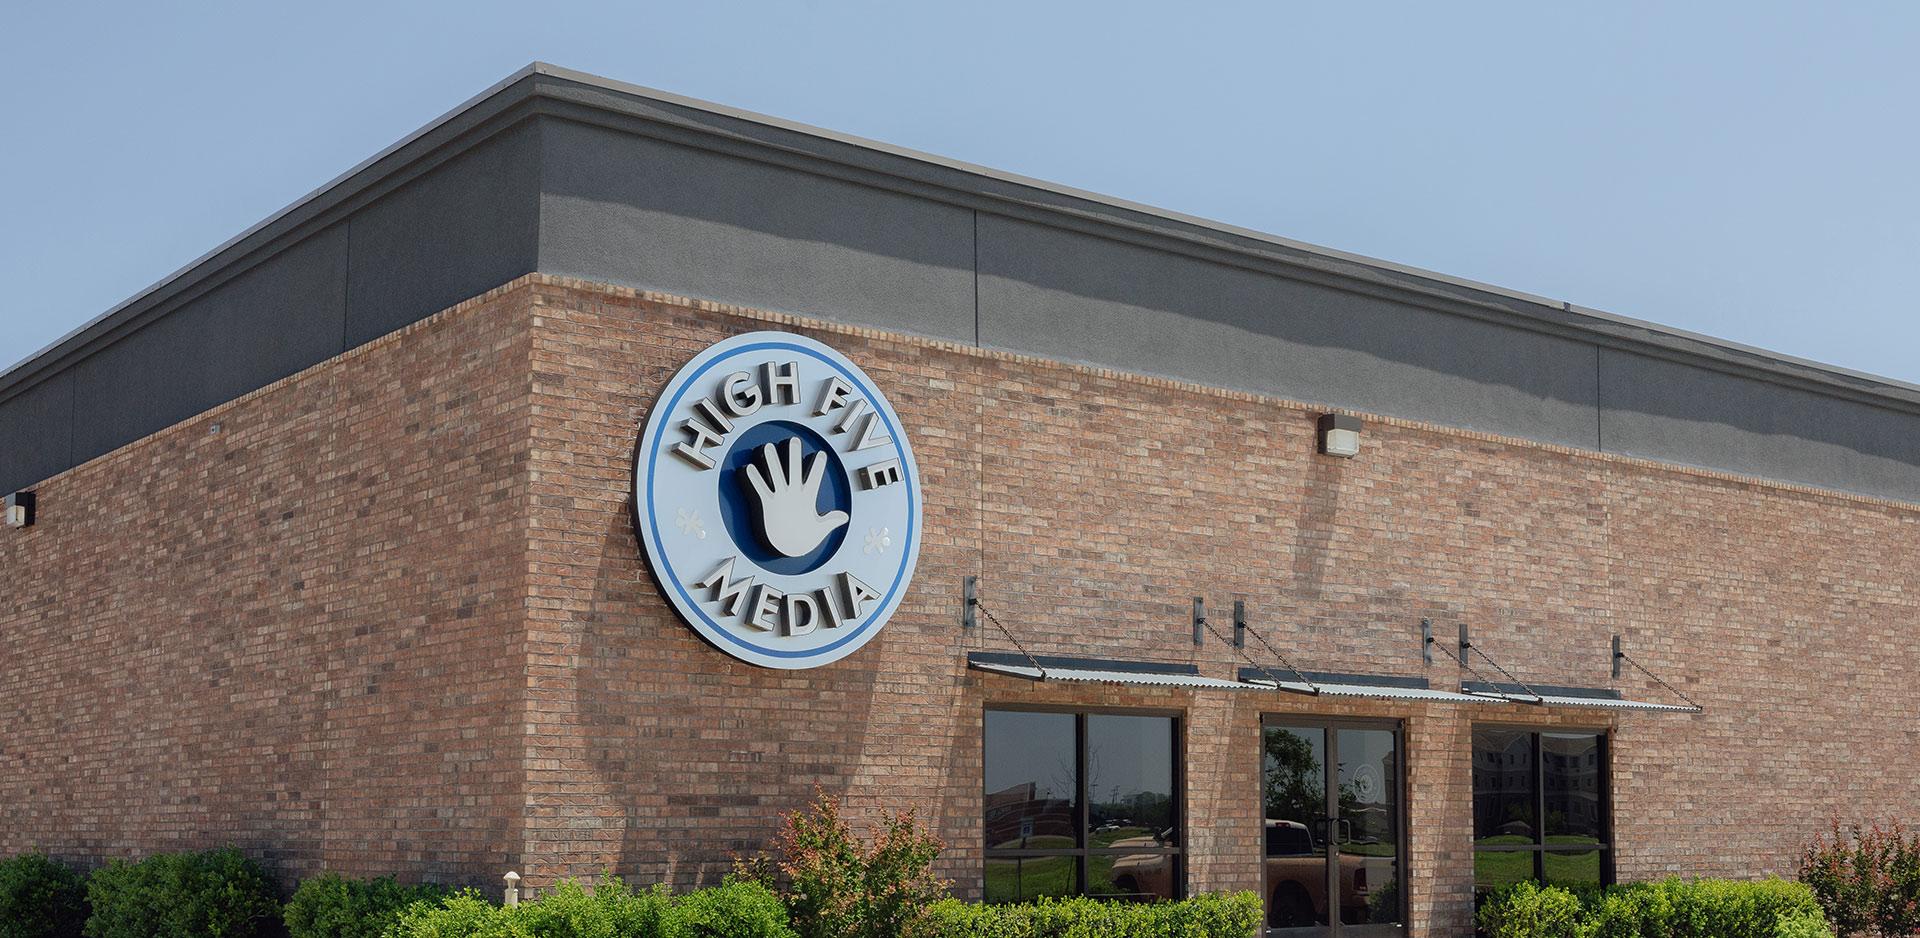 High Five Media exterior office